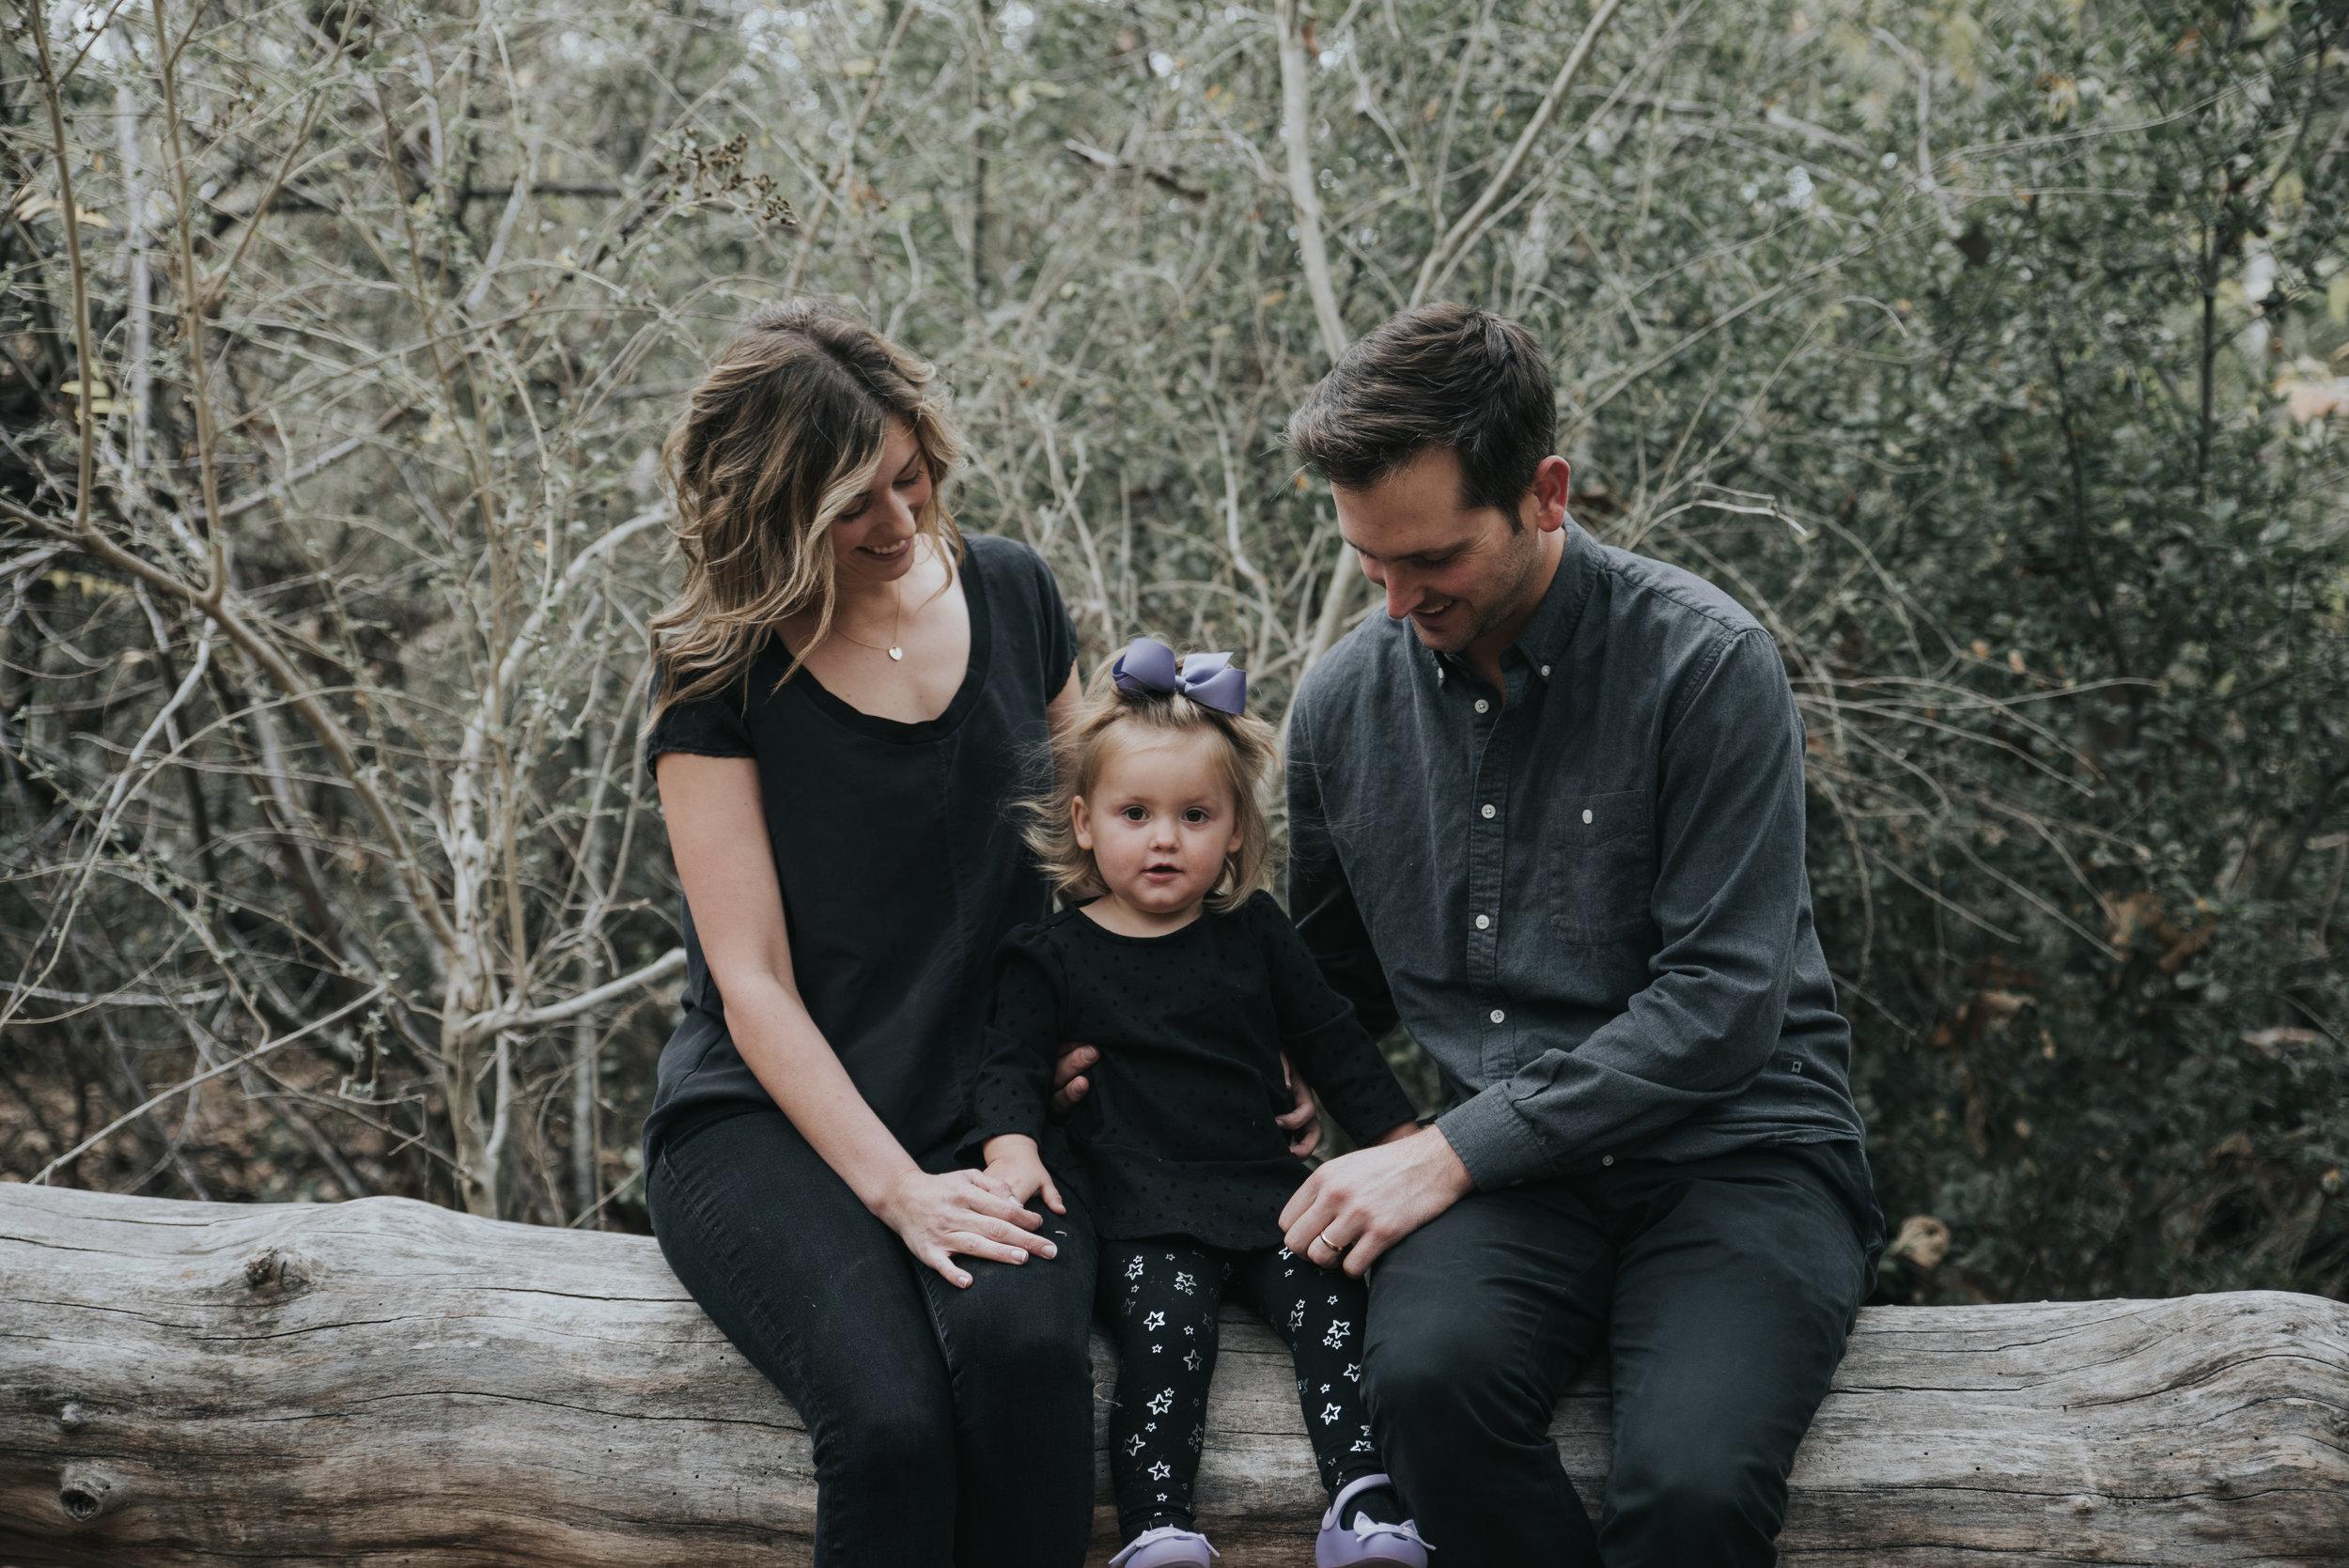 Family - Portrait Sessions